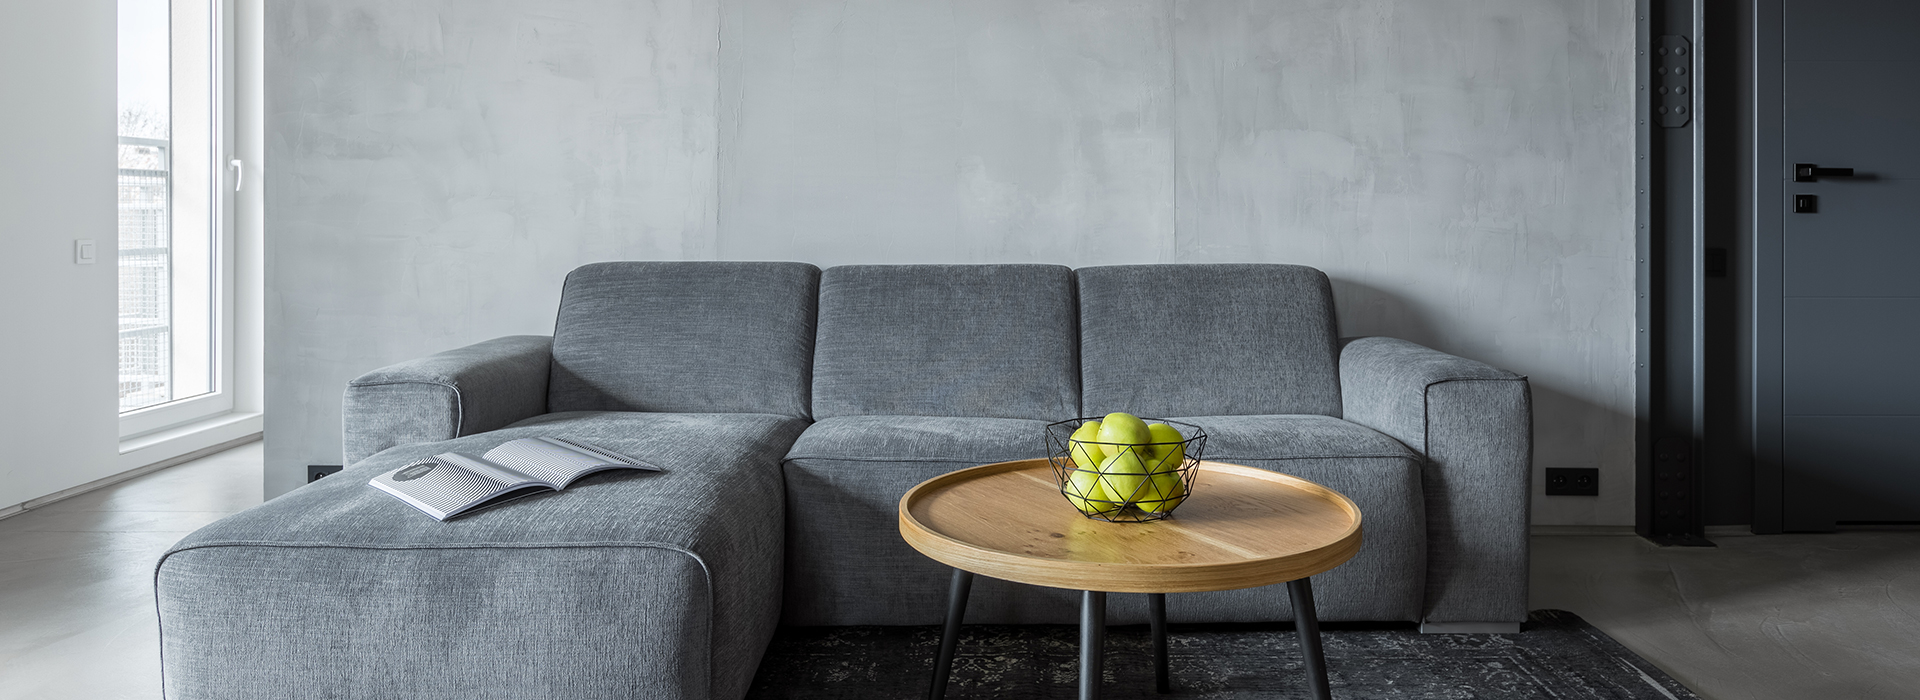 Grey style interior